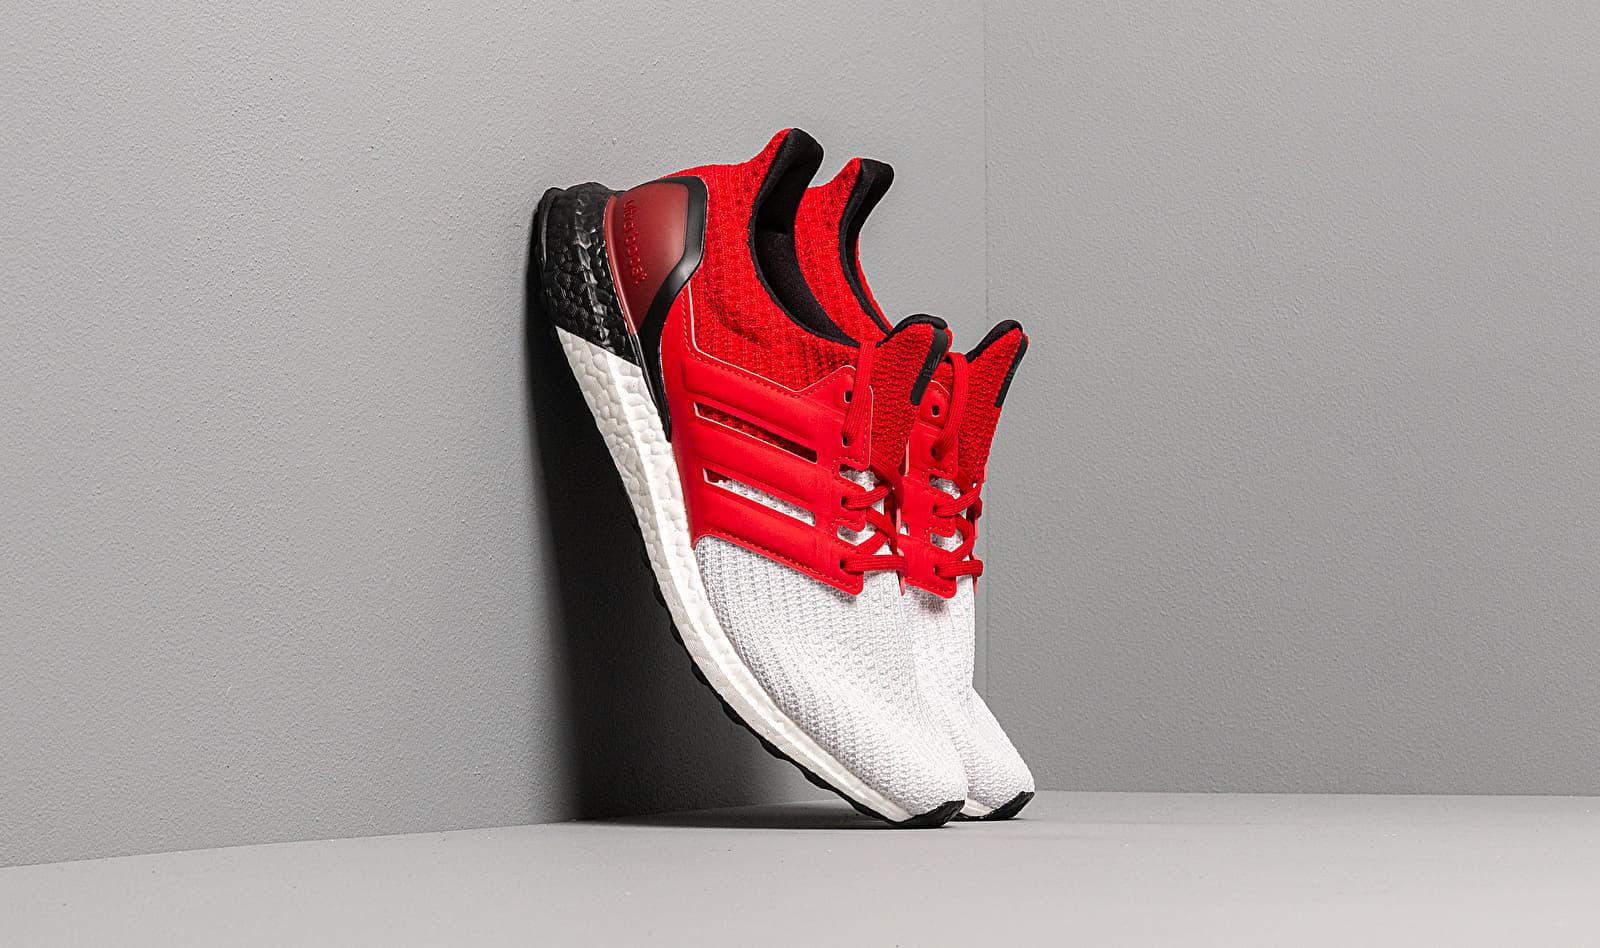 Adidas Ultraboost M Ftw White/ Scarlet/ Core Black